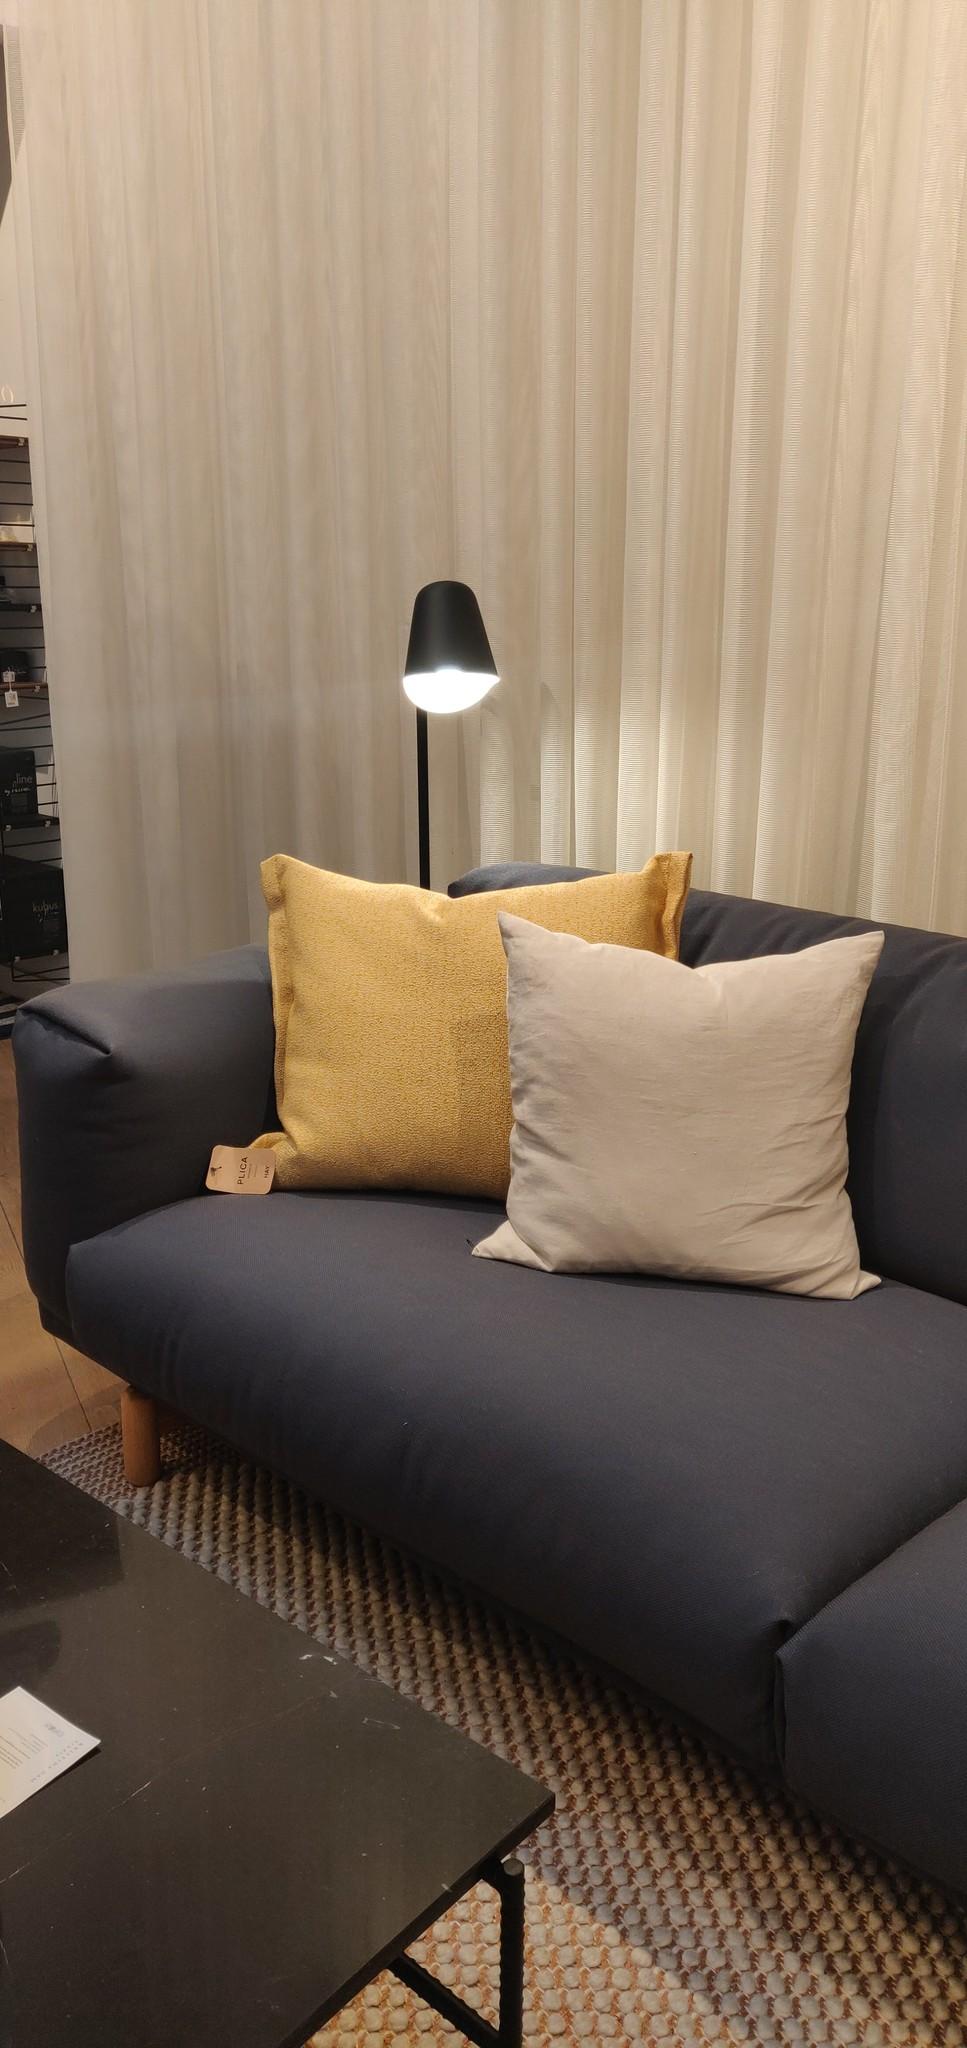 Toonzaalmodel Rest sofa - 3-seater - Steelcut trio3 756-2